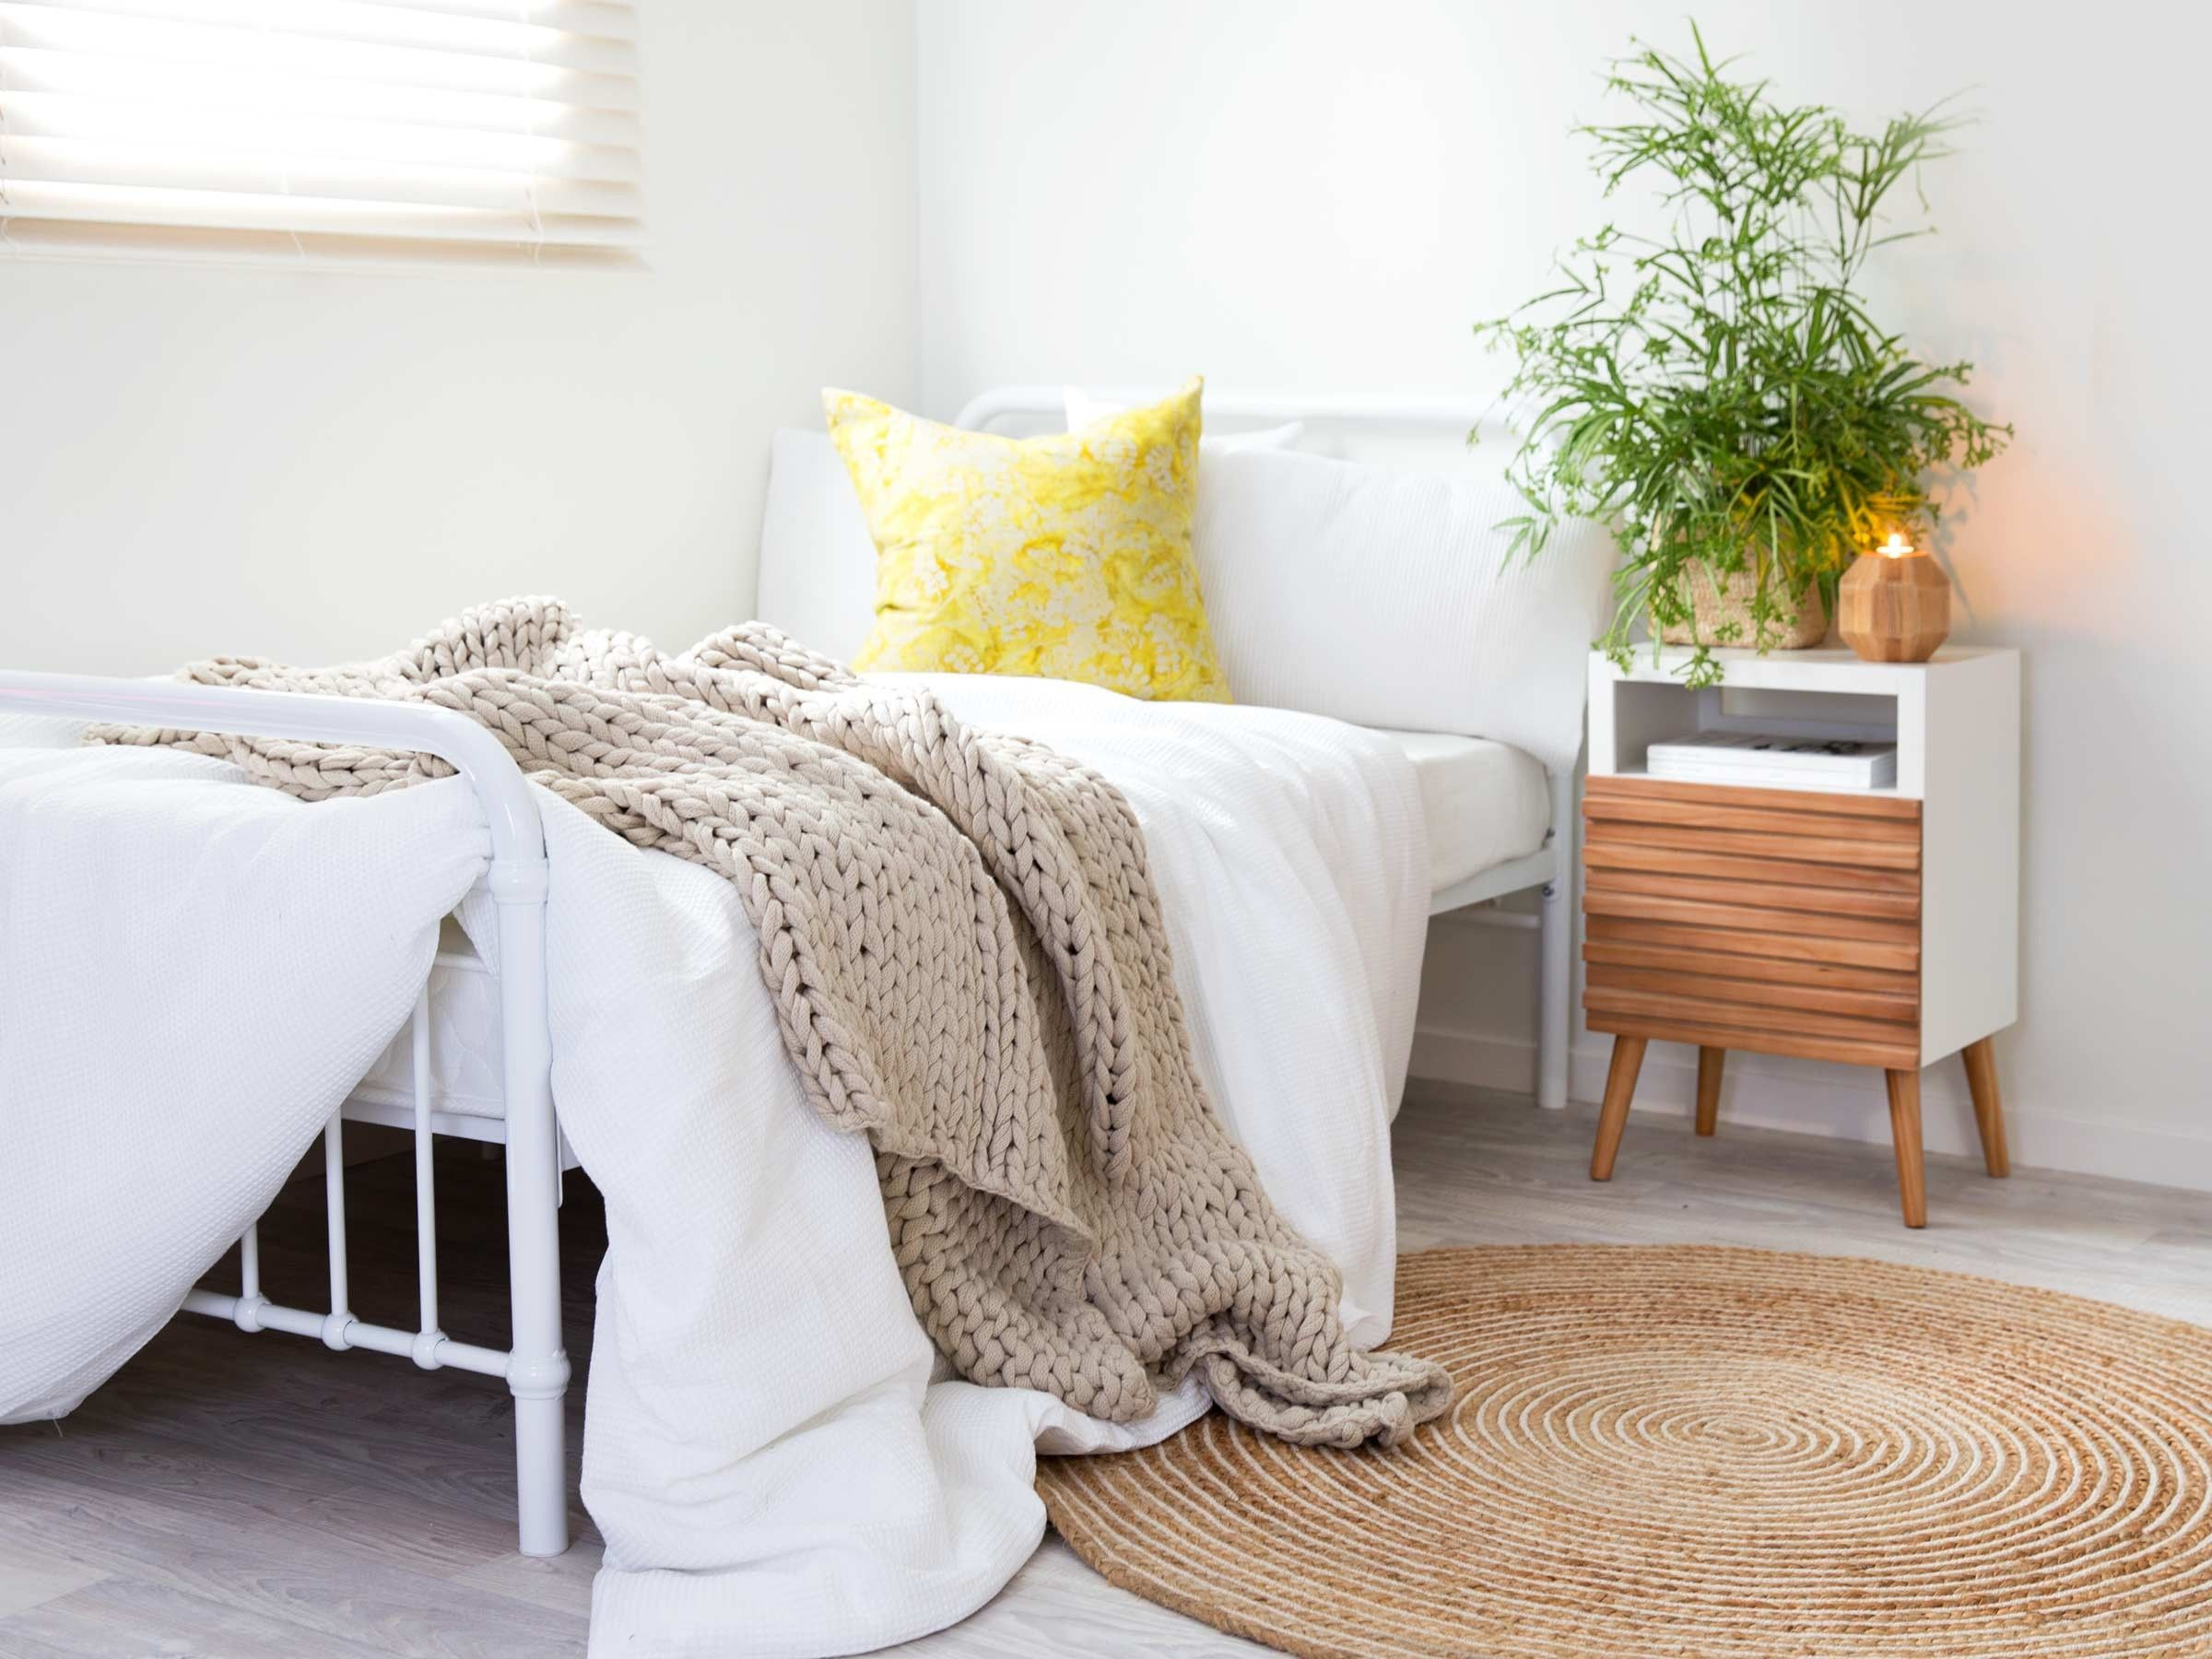 Mocka Sonata Bed | Kids Bedroom Furniture | Mocka